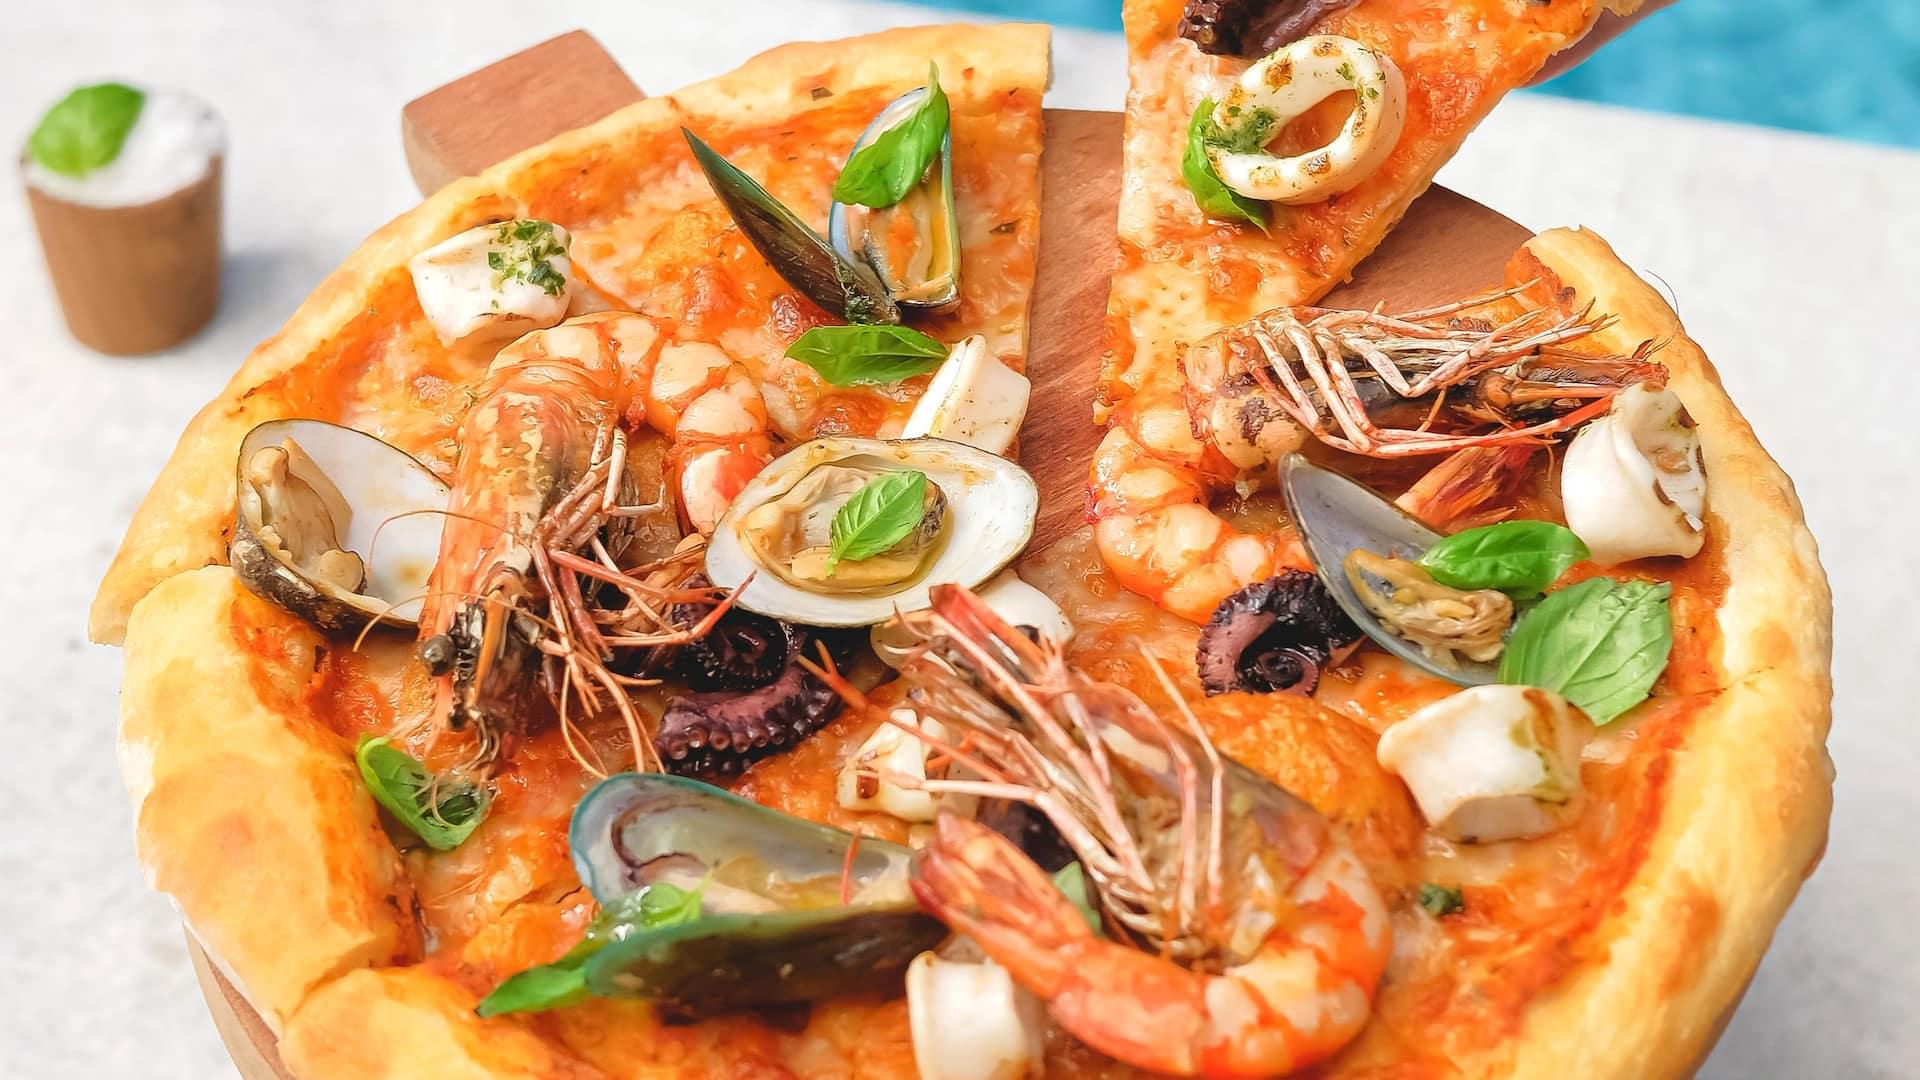 Pizza Italian restaurant near Nusa Dua Bali (Salsa Verde - Grand Hyatt Bali)